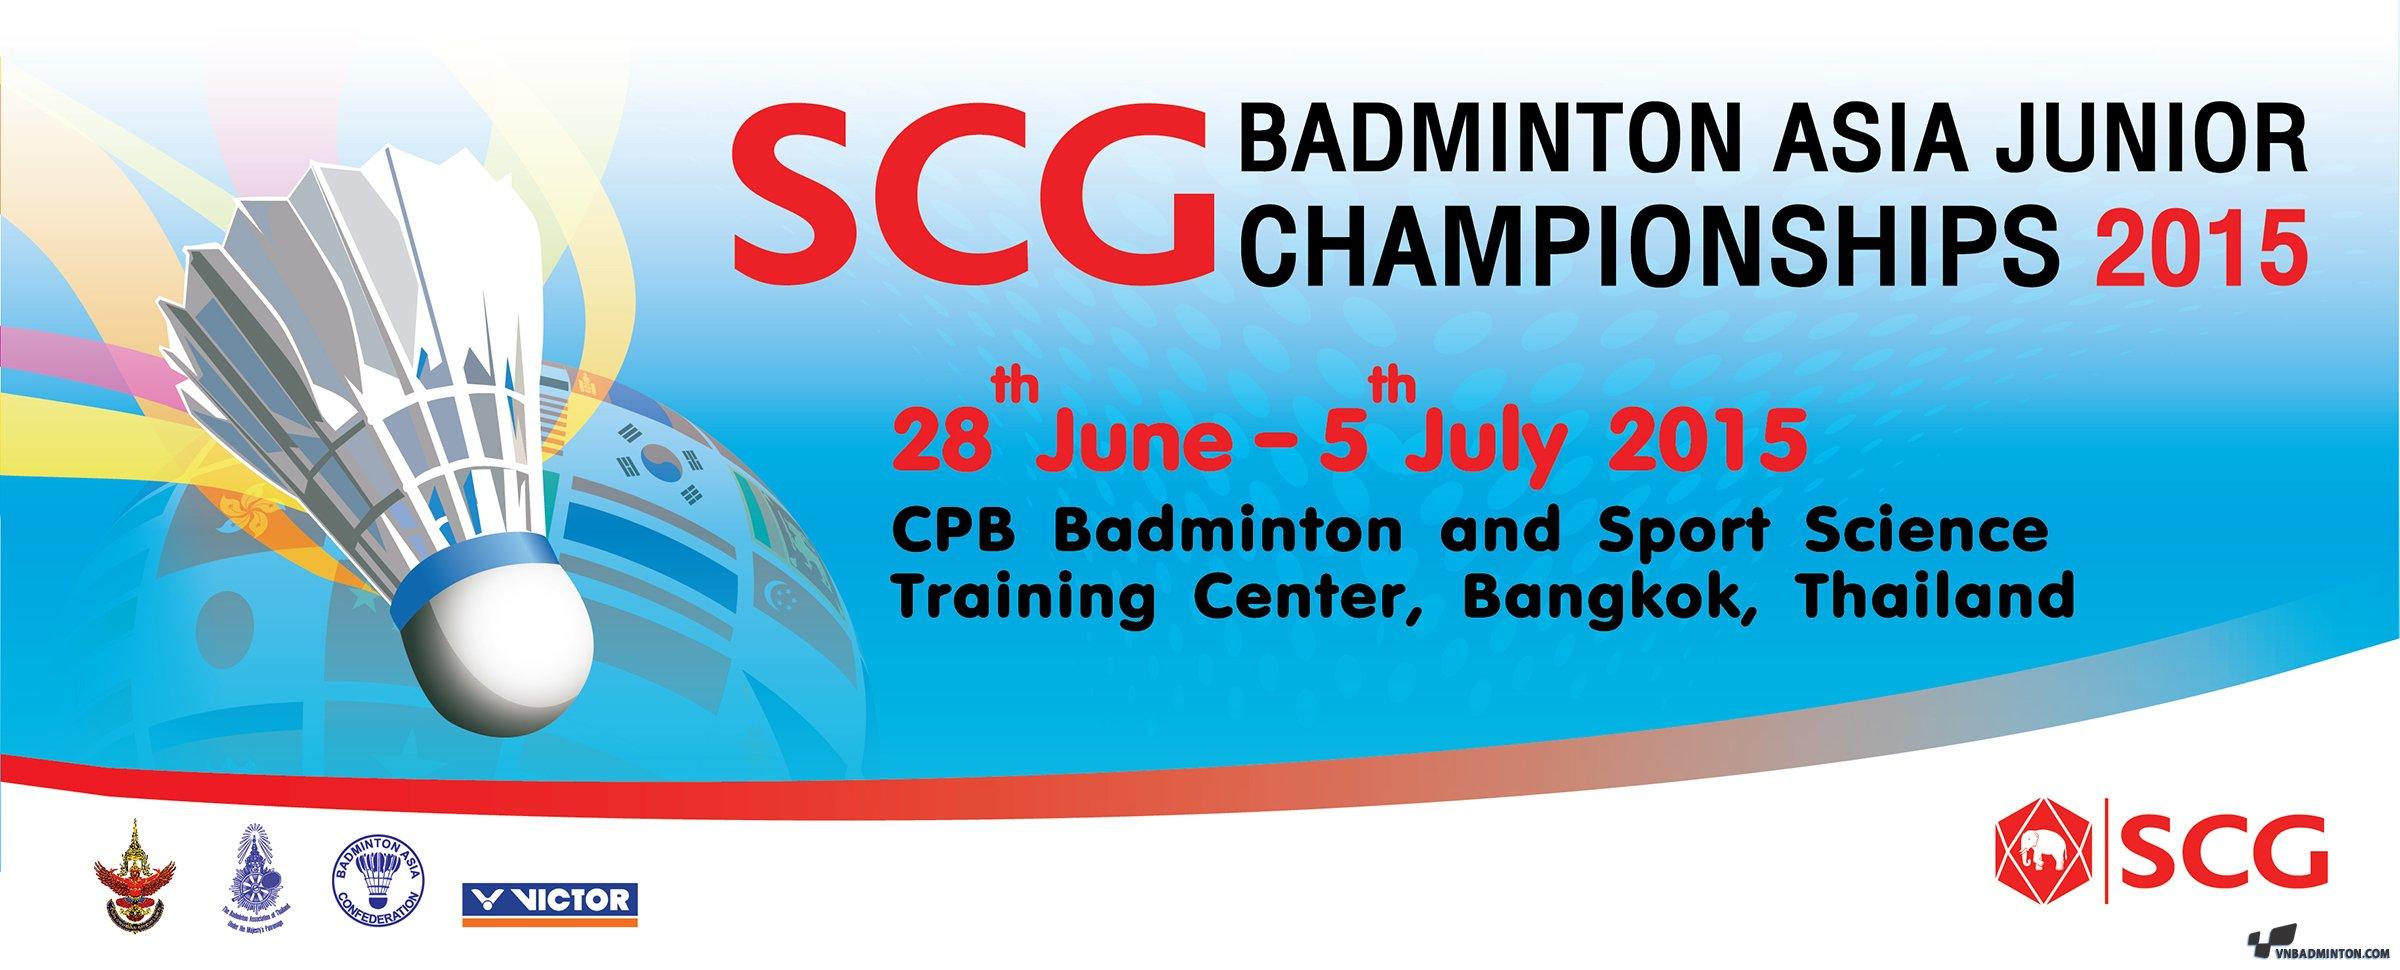 AW_SCG_Badminton Asia Junior Championships 2015_Banner.jpg